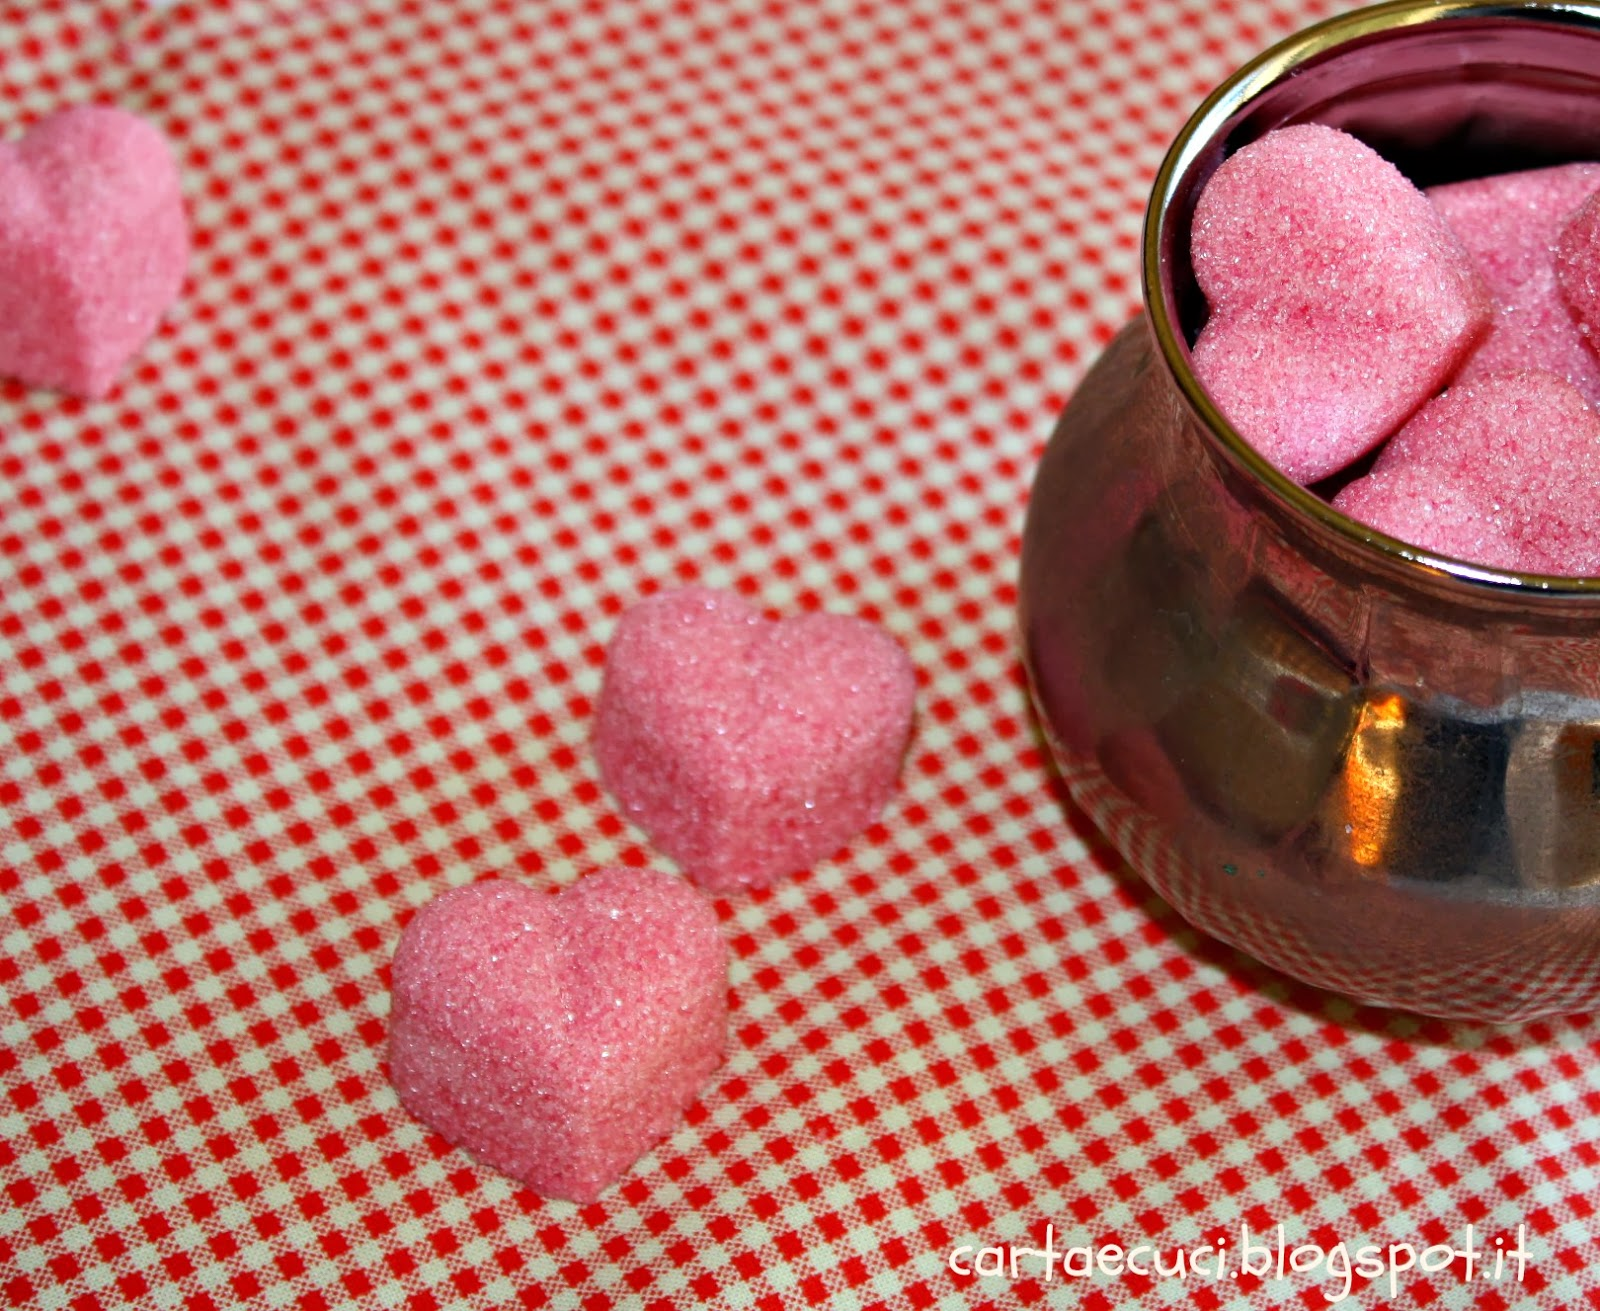 http://cartaecuci.blogspot.it/2014/02/quattordici-idee-per-san-valentino.html